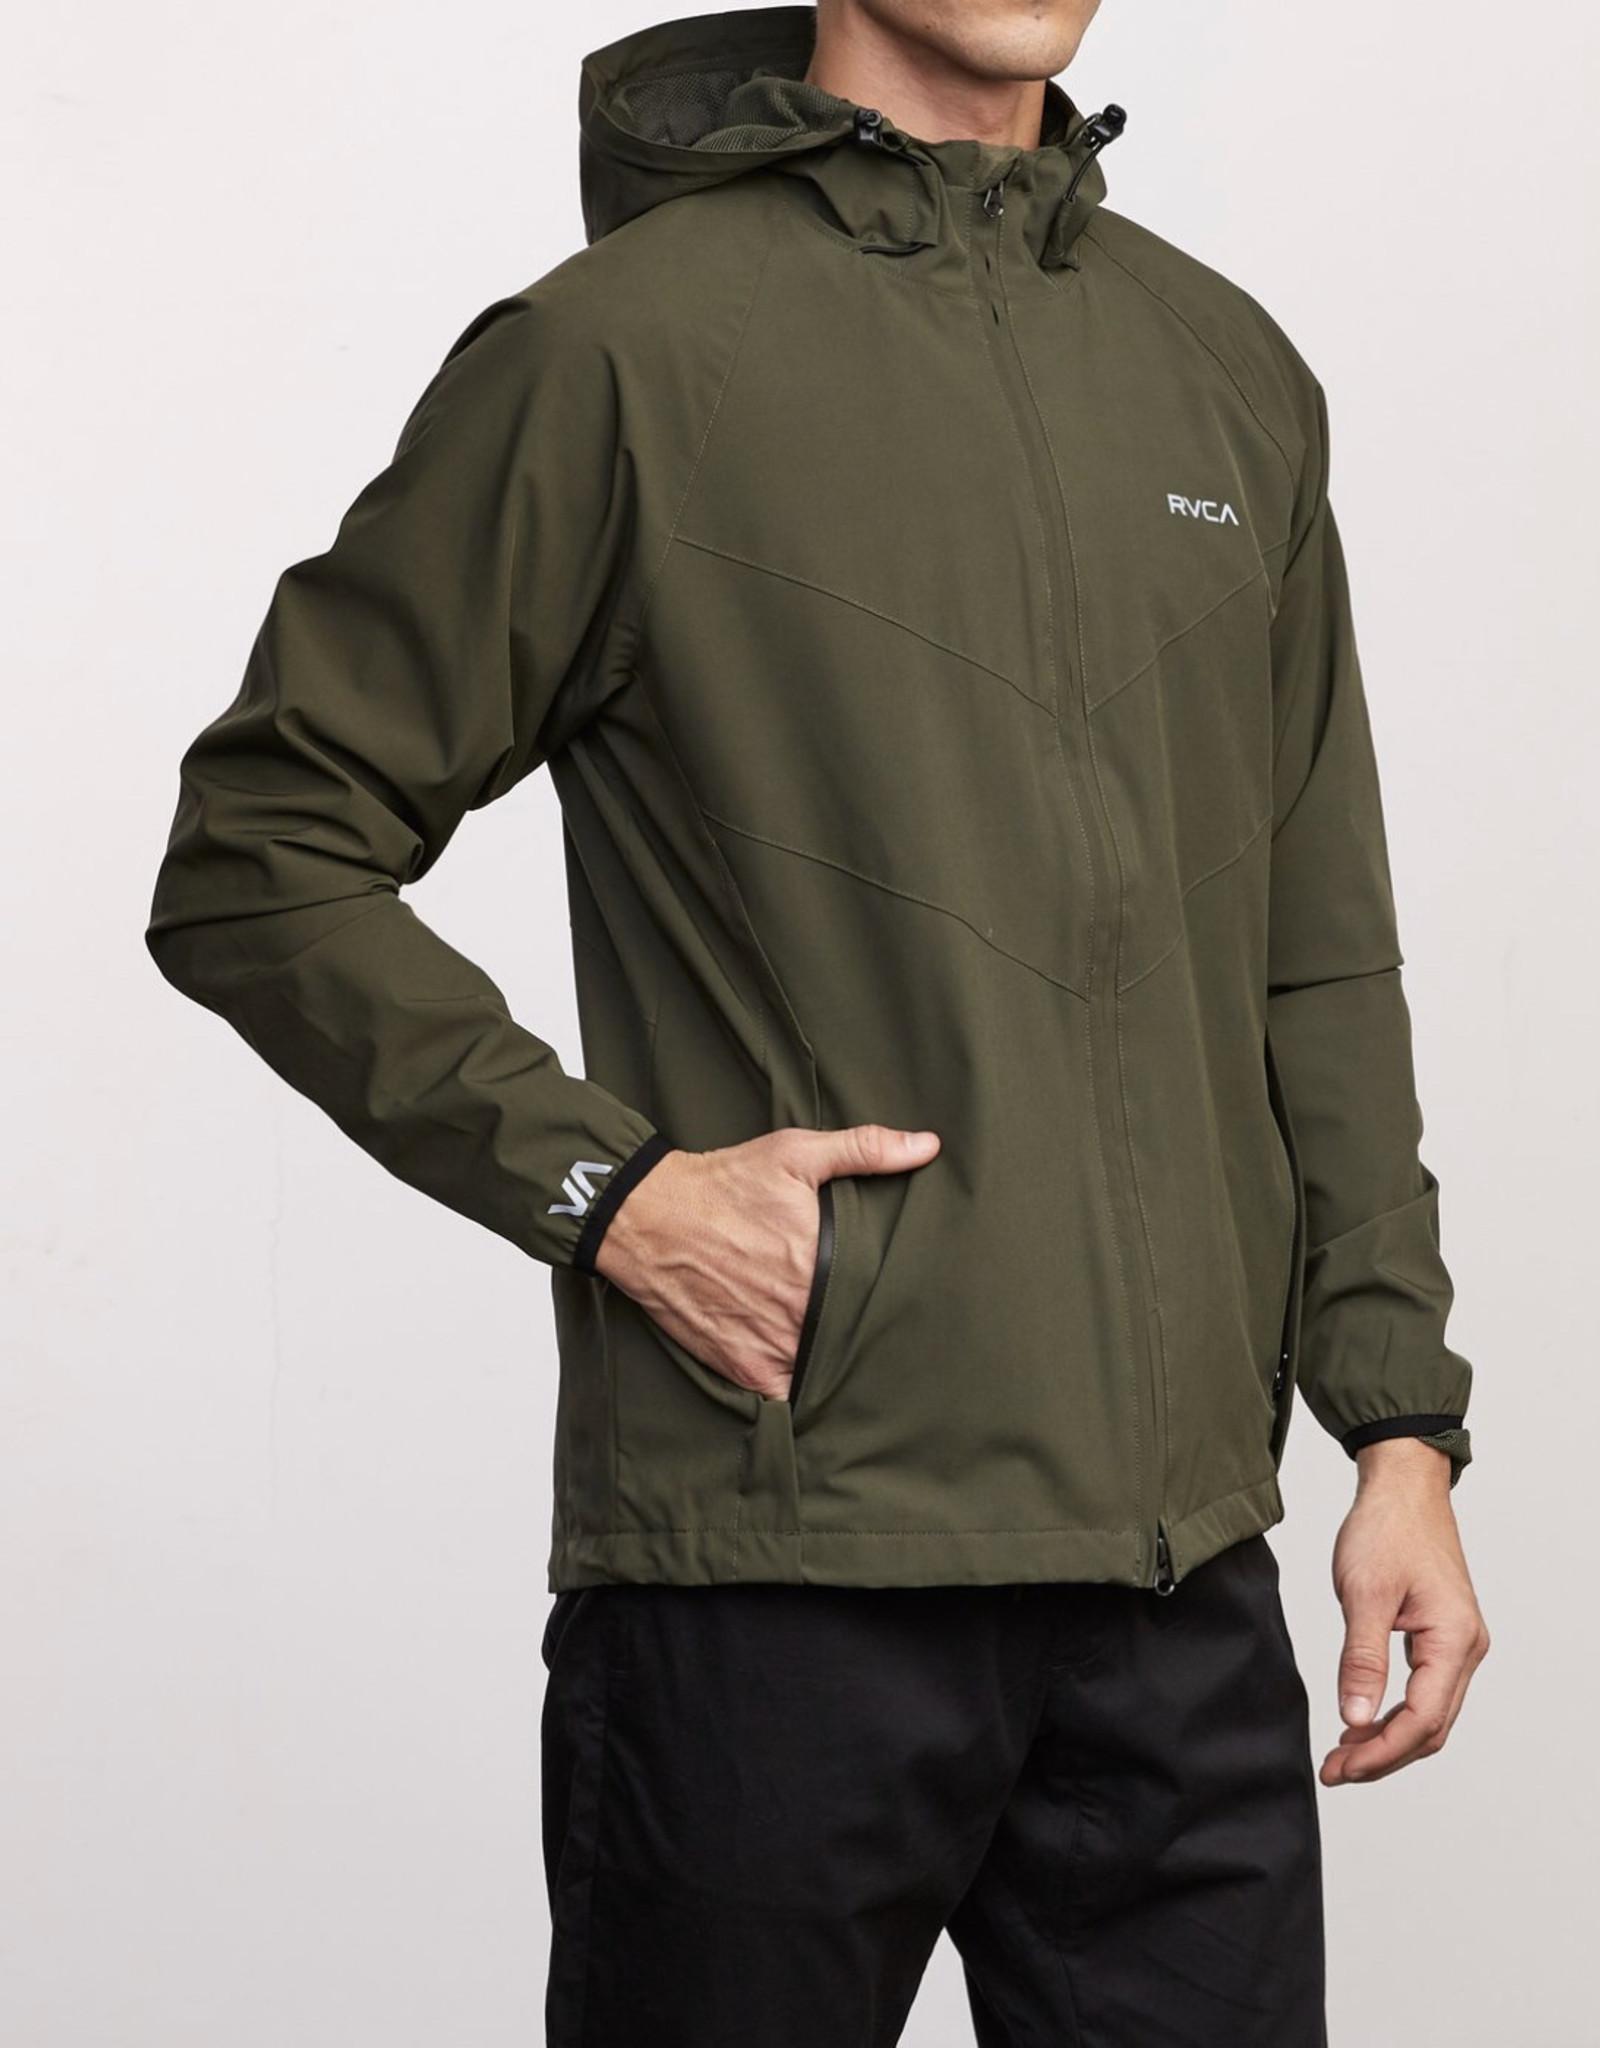 RVCA VA Windbreaker Jacket